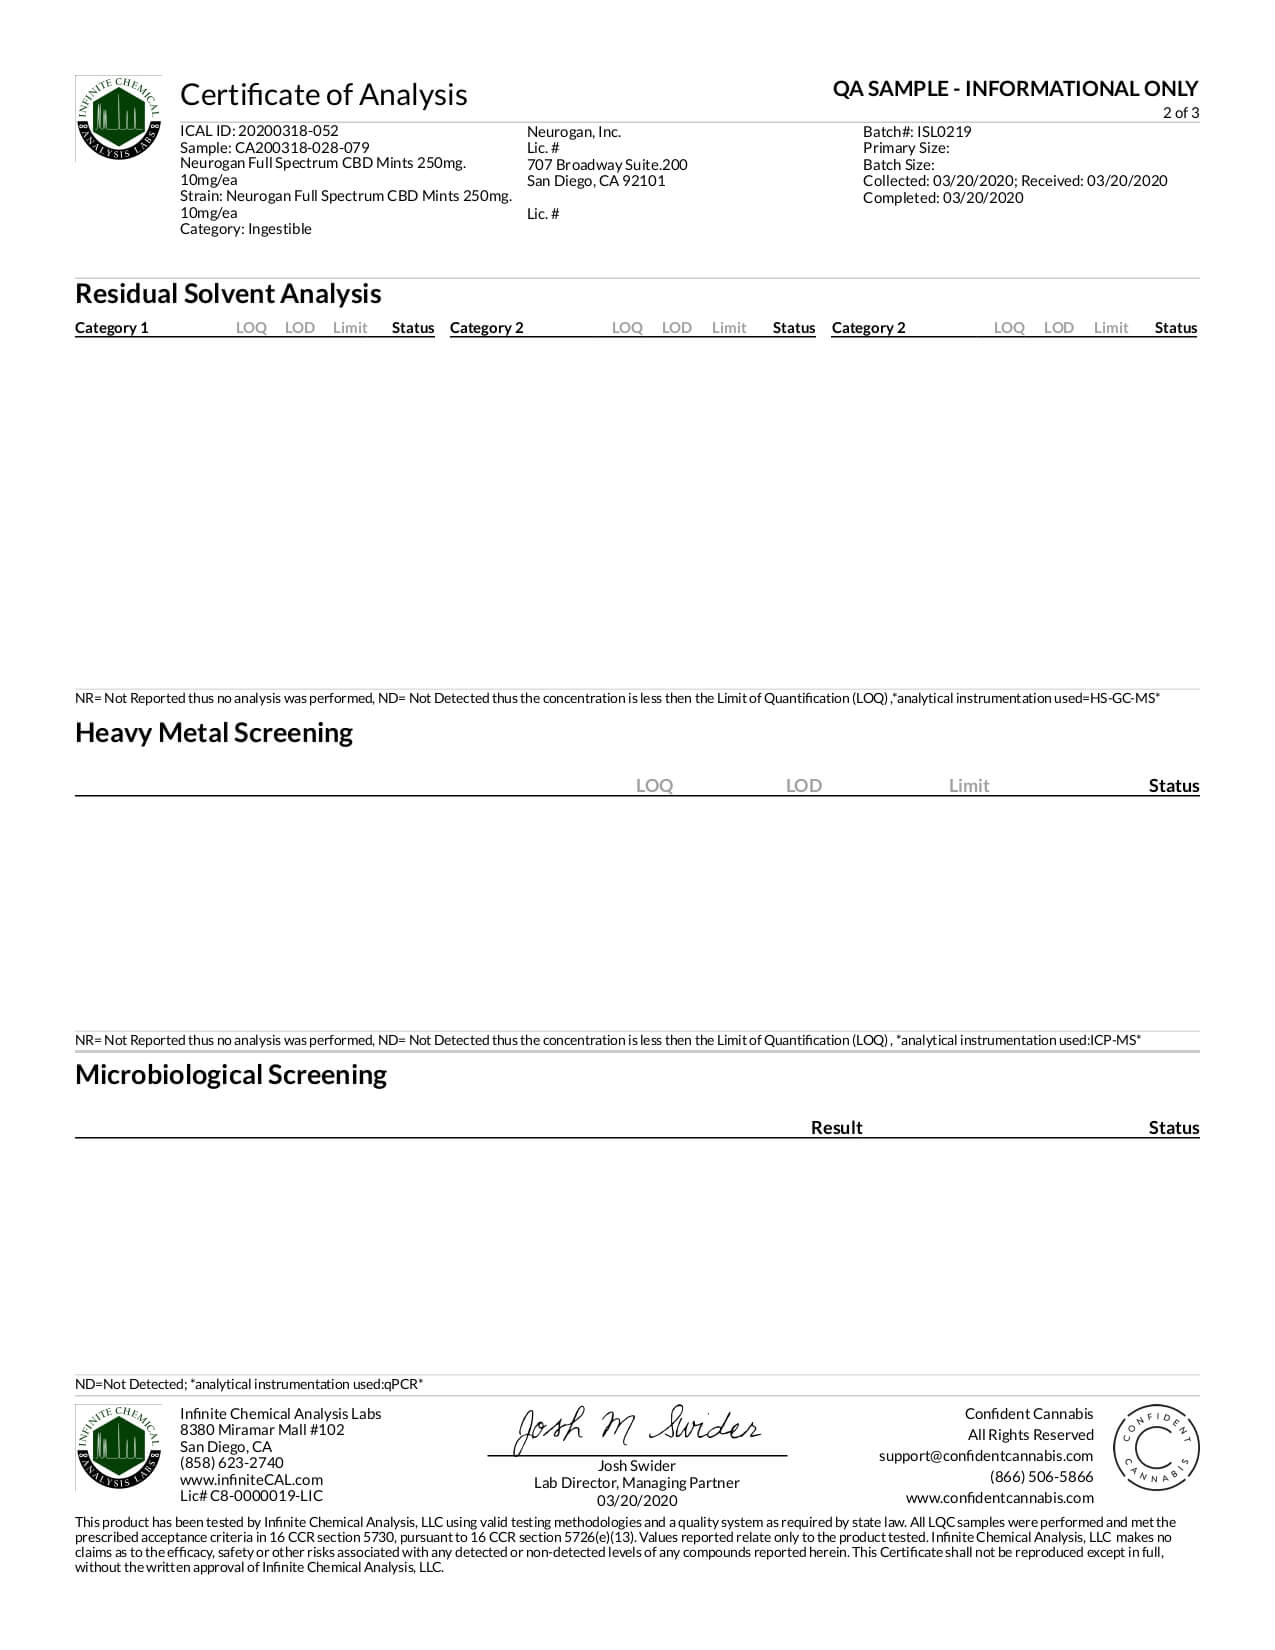 Neurogan, Inc. CBD Edible Full Spectrum Mints Lab Report